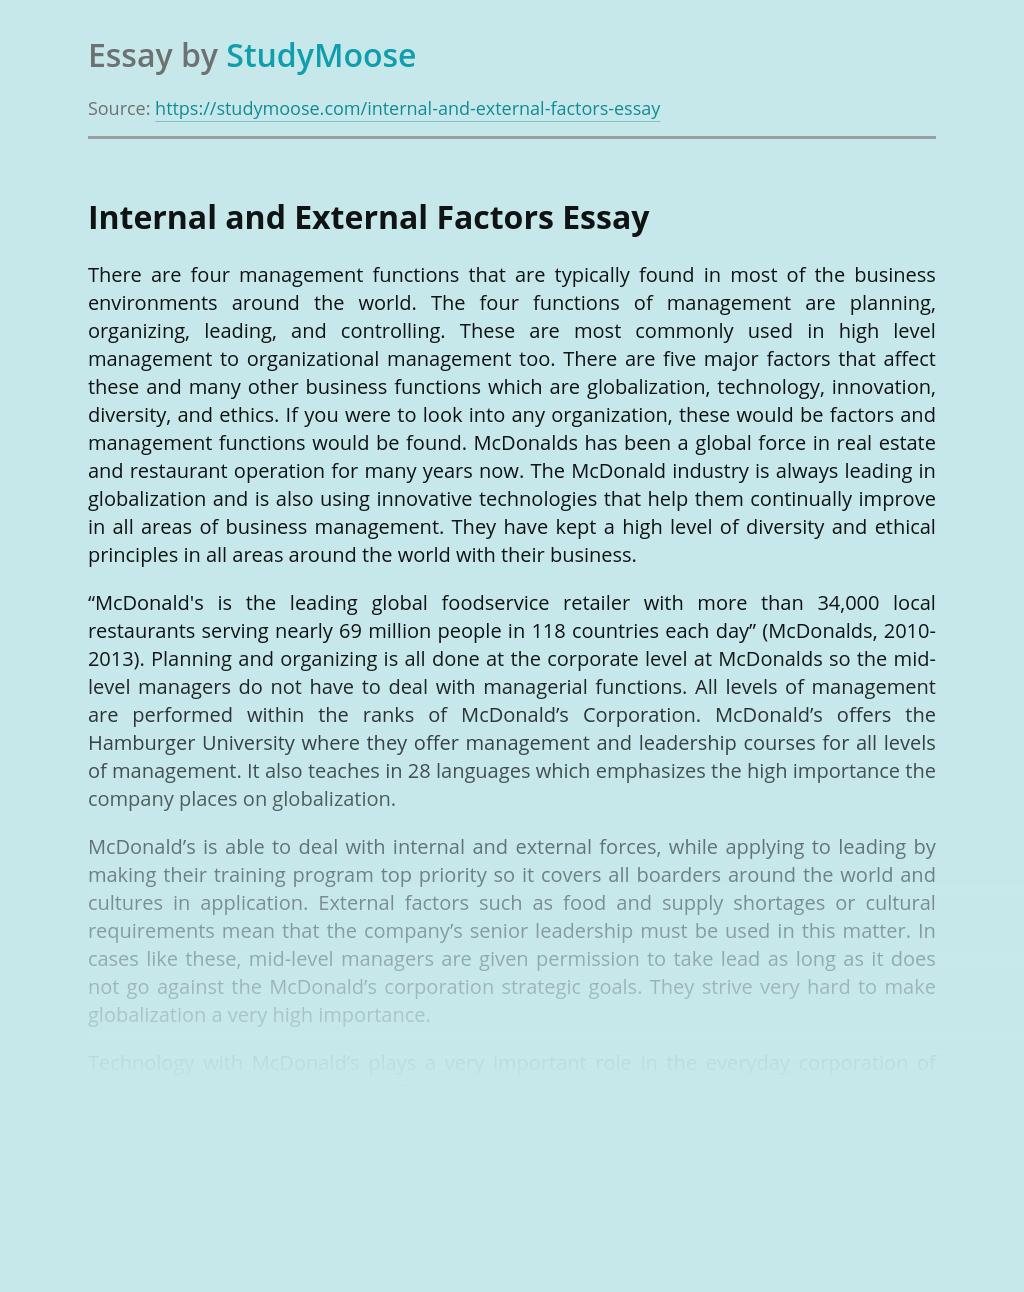 Internal and External Factors of McDonald's Management